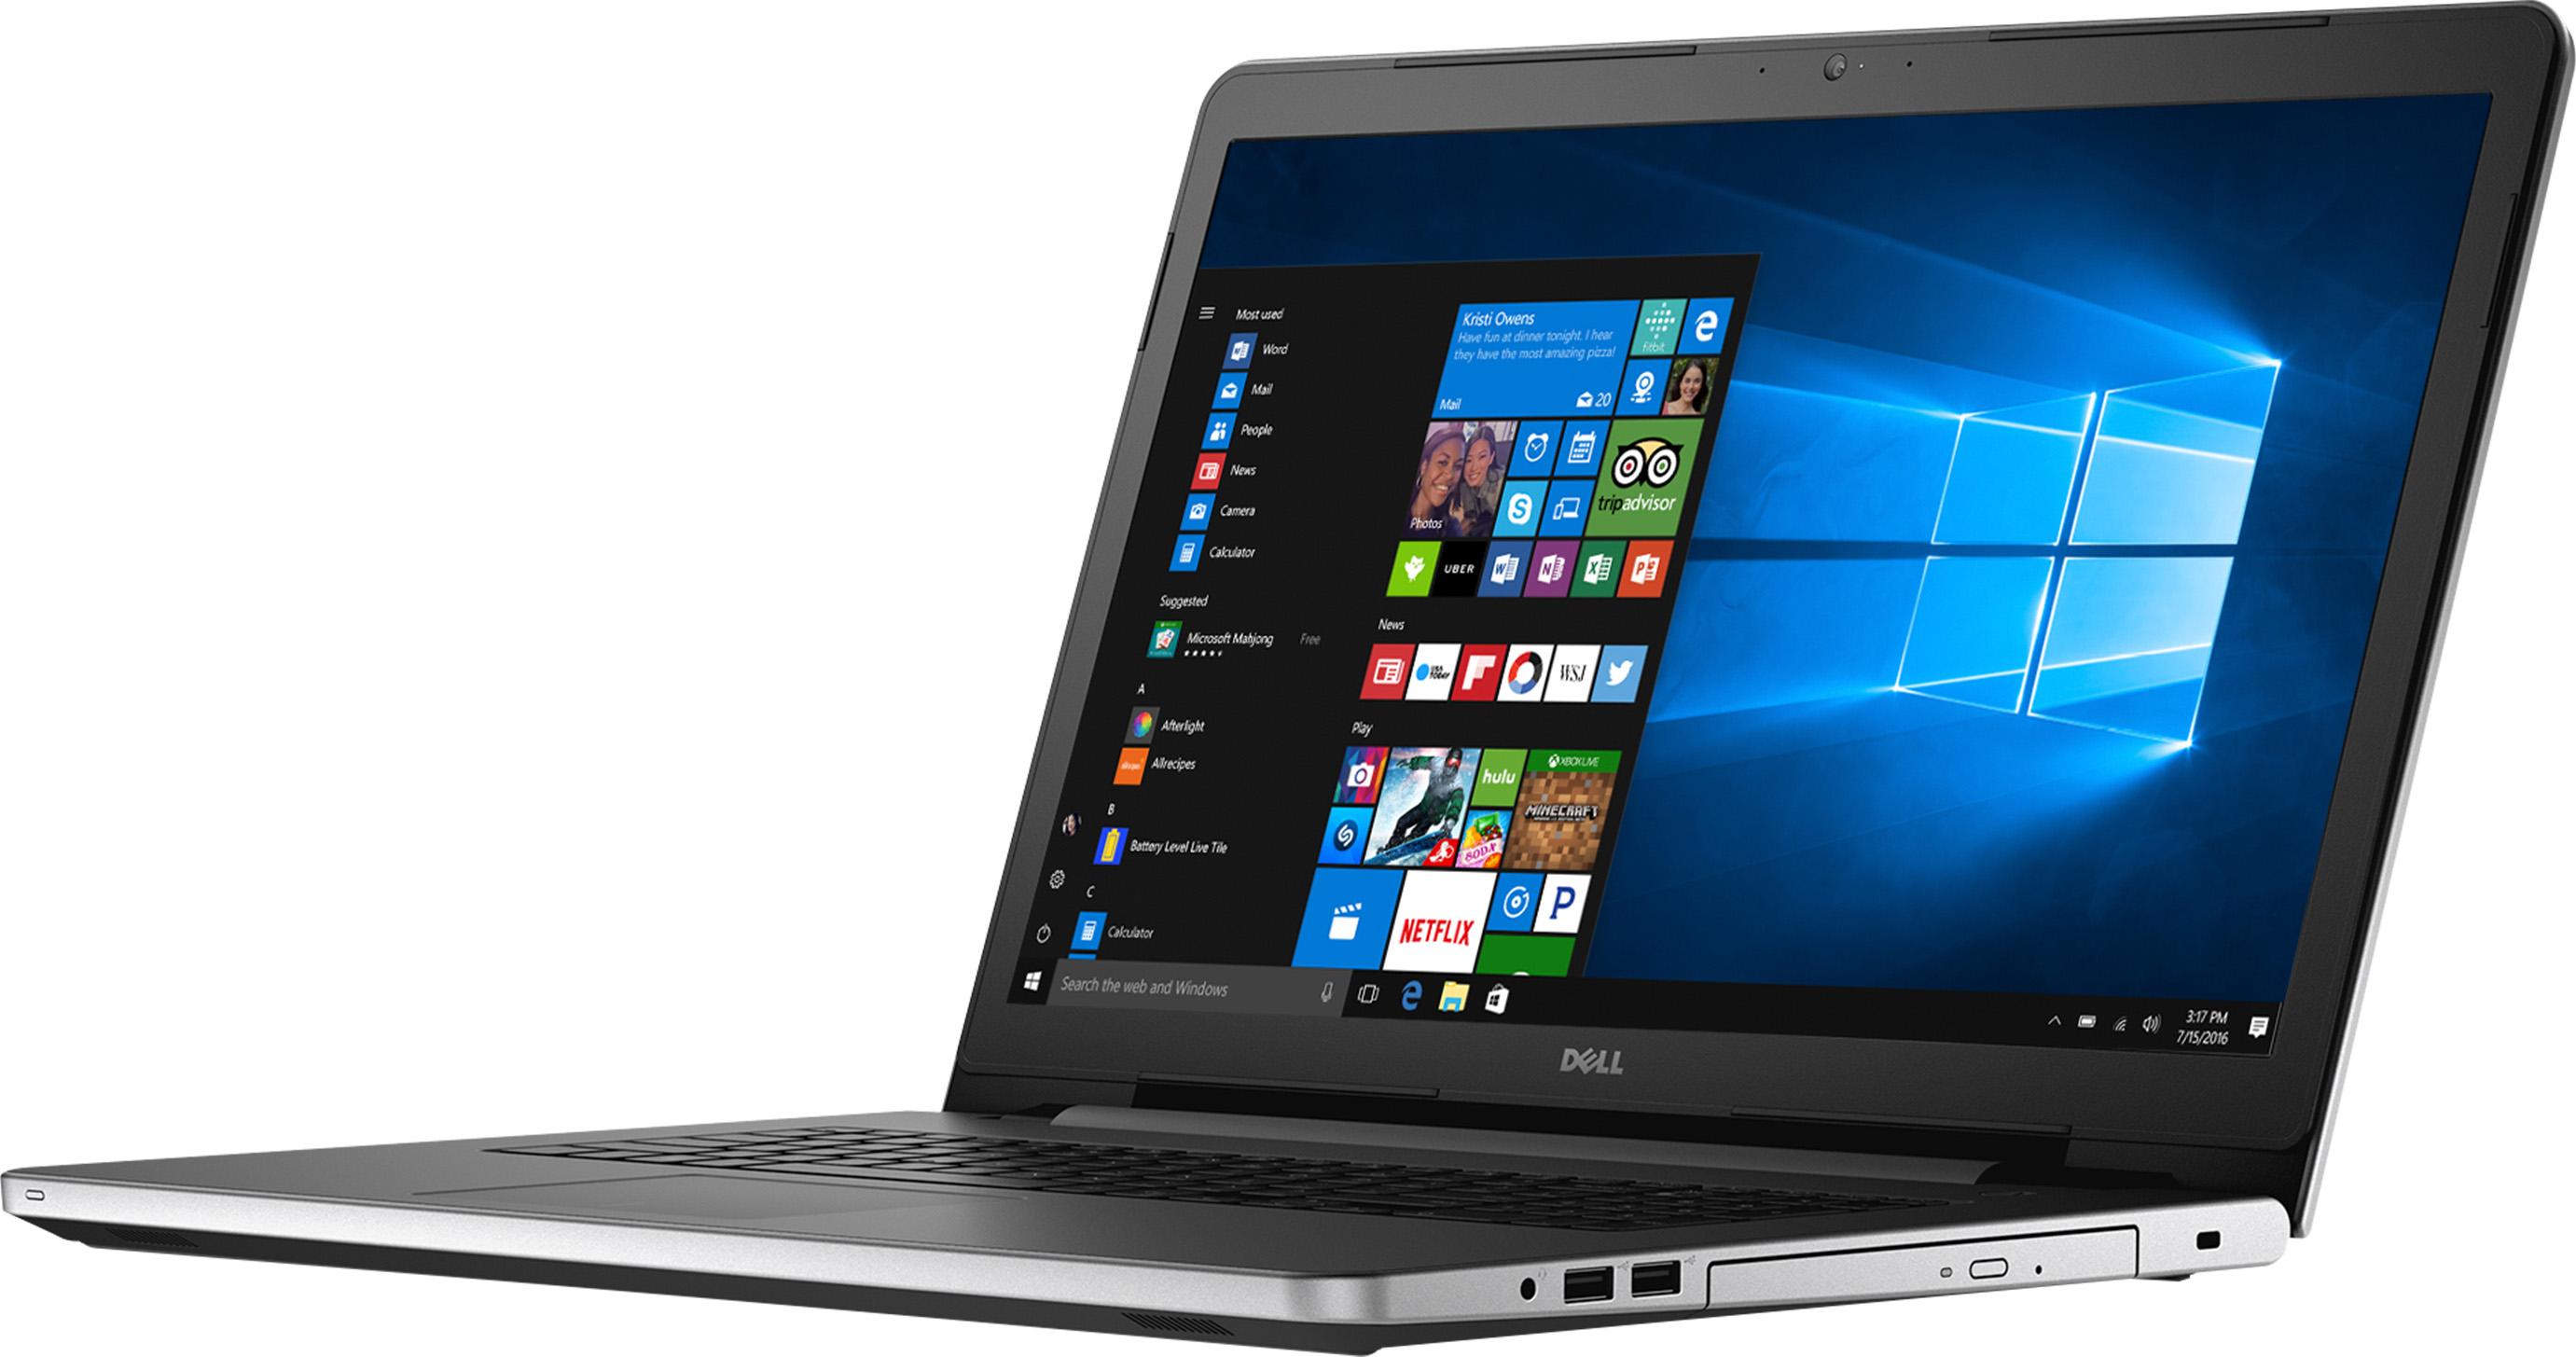 Dell Inspiron 17 i5759-8837SLV Signature Edition Laptop